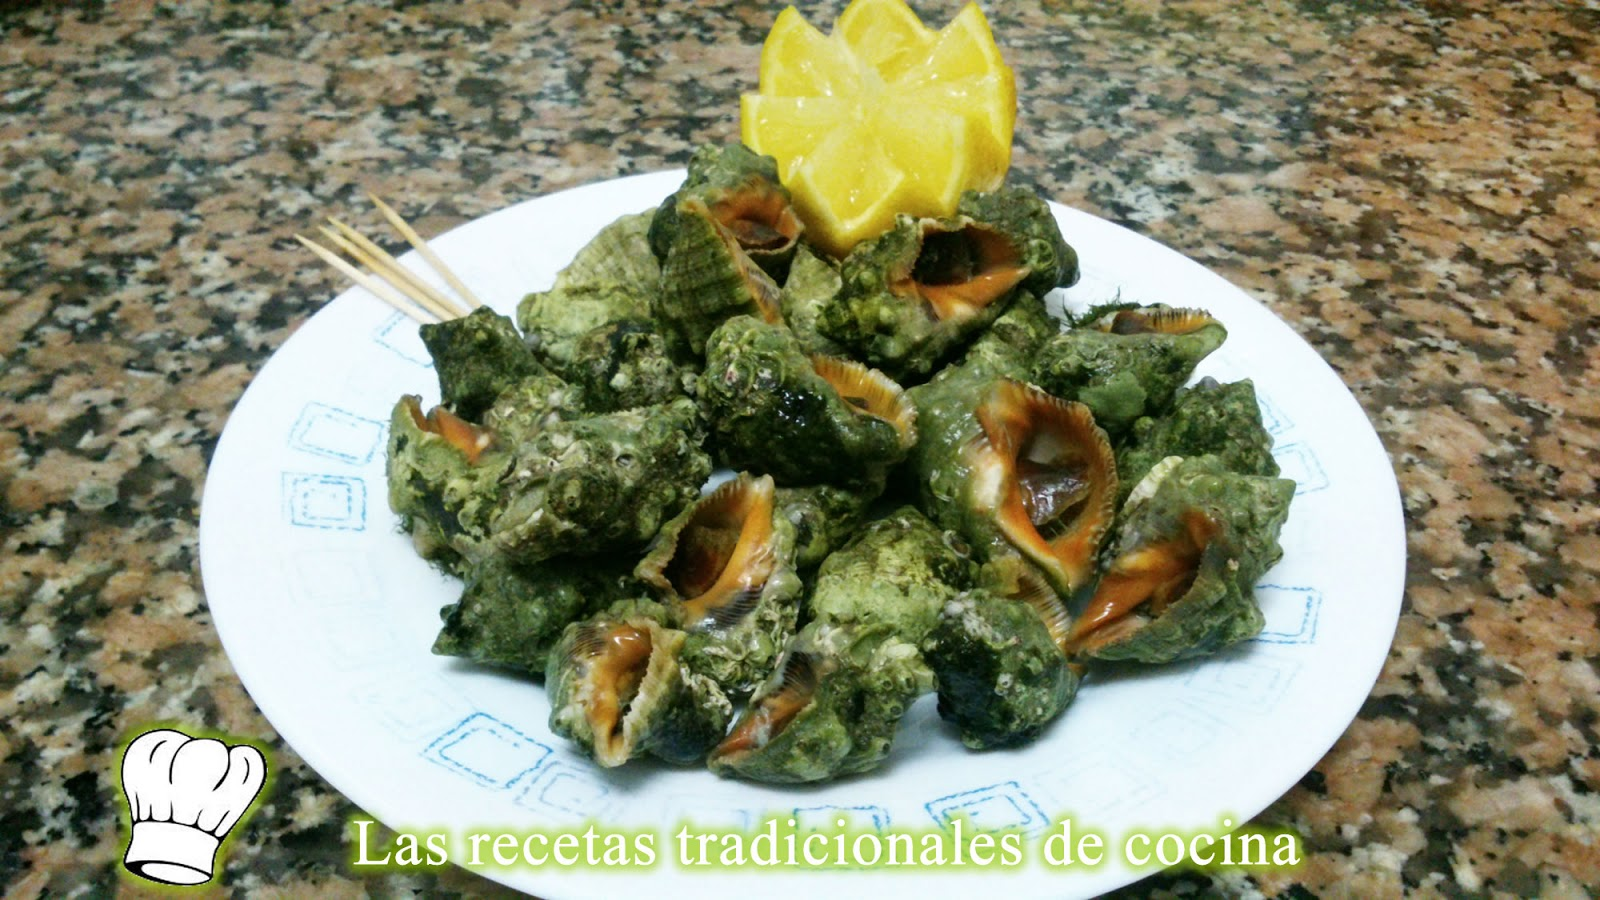 Como Cocinar Caracoles | Receta De Caracoles De Mar Recetas De Cocina Con Sabor Tradicional